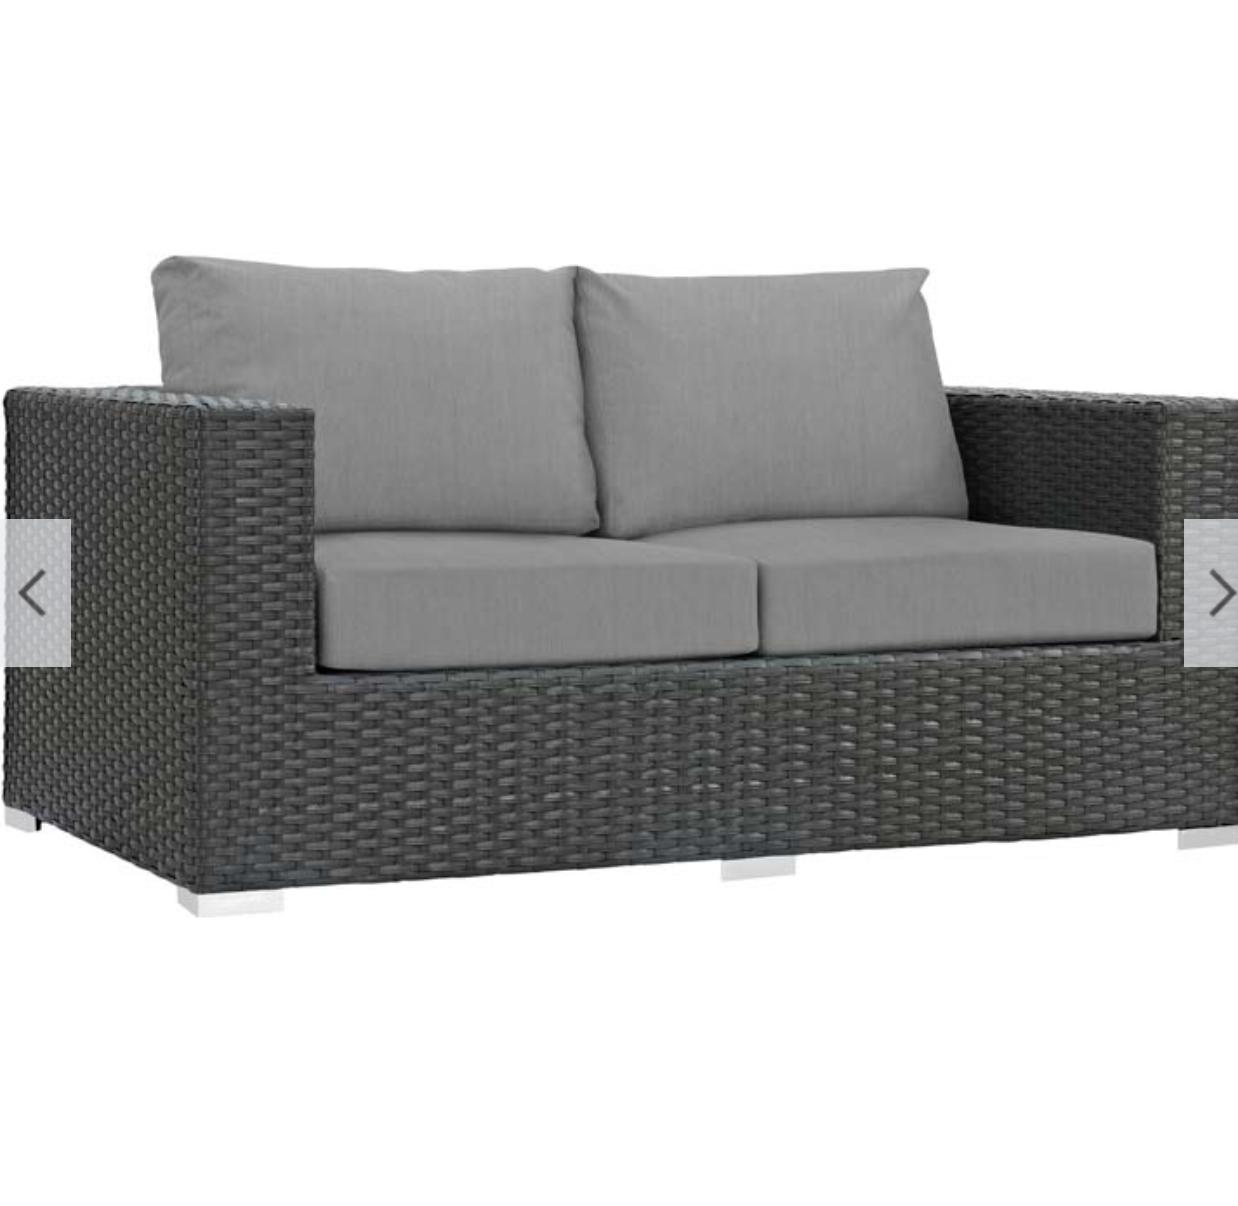 Rattan Loveseat with Gray Cushions - Rattan Patio Sunbrella® Loveseat - Patio Furniture Co